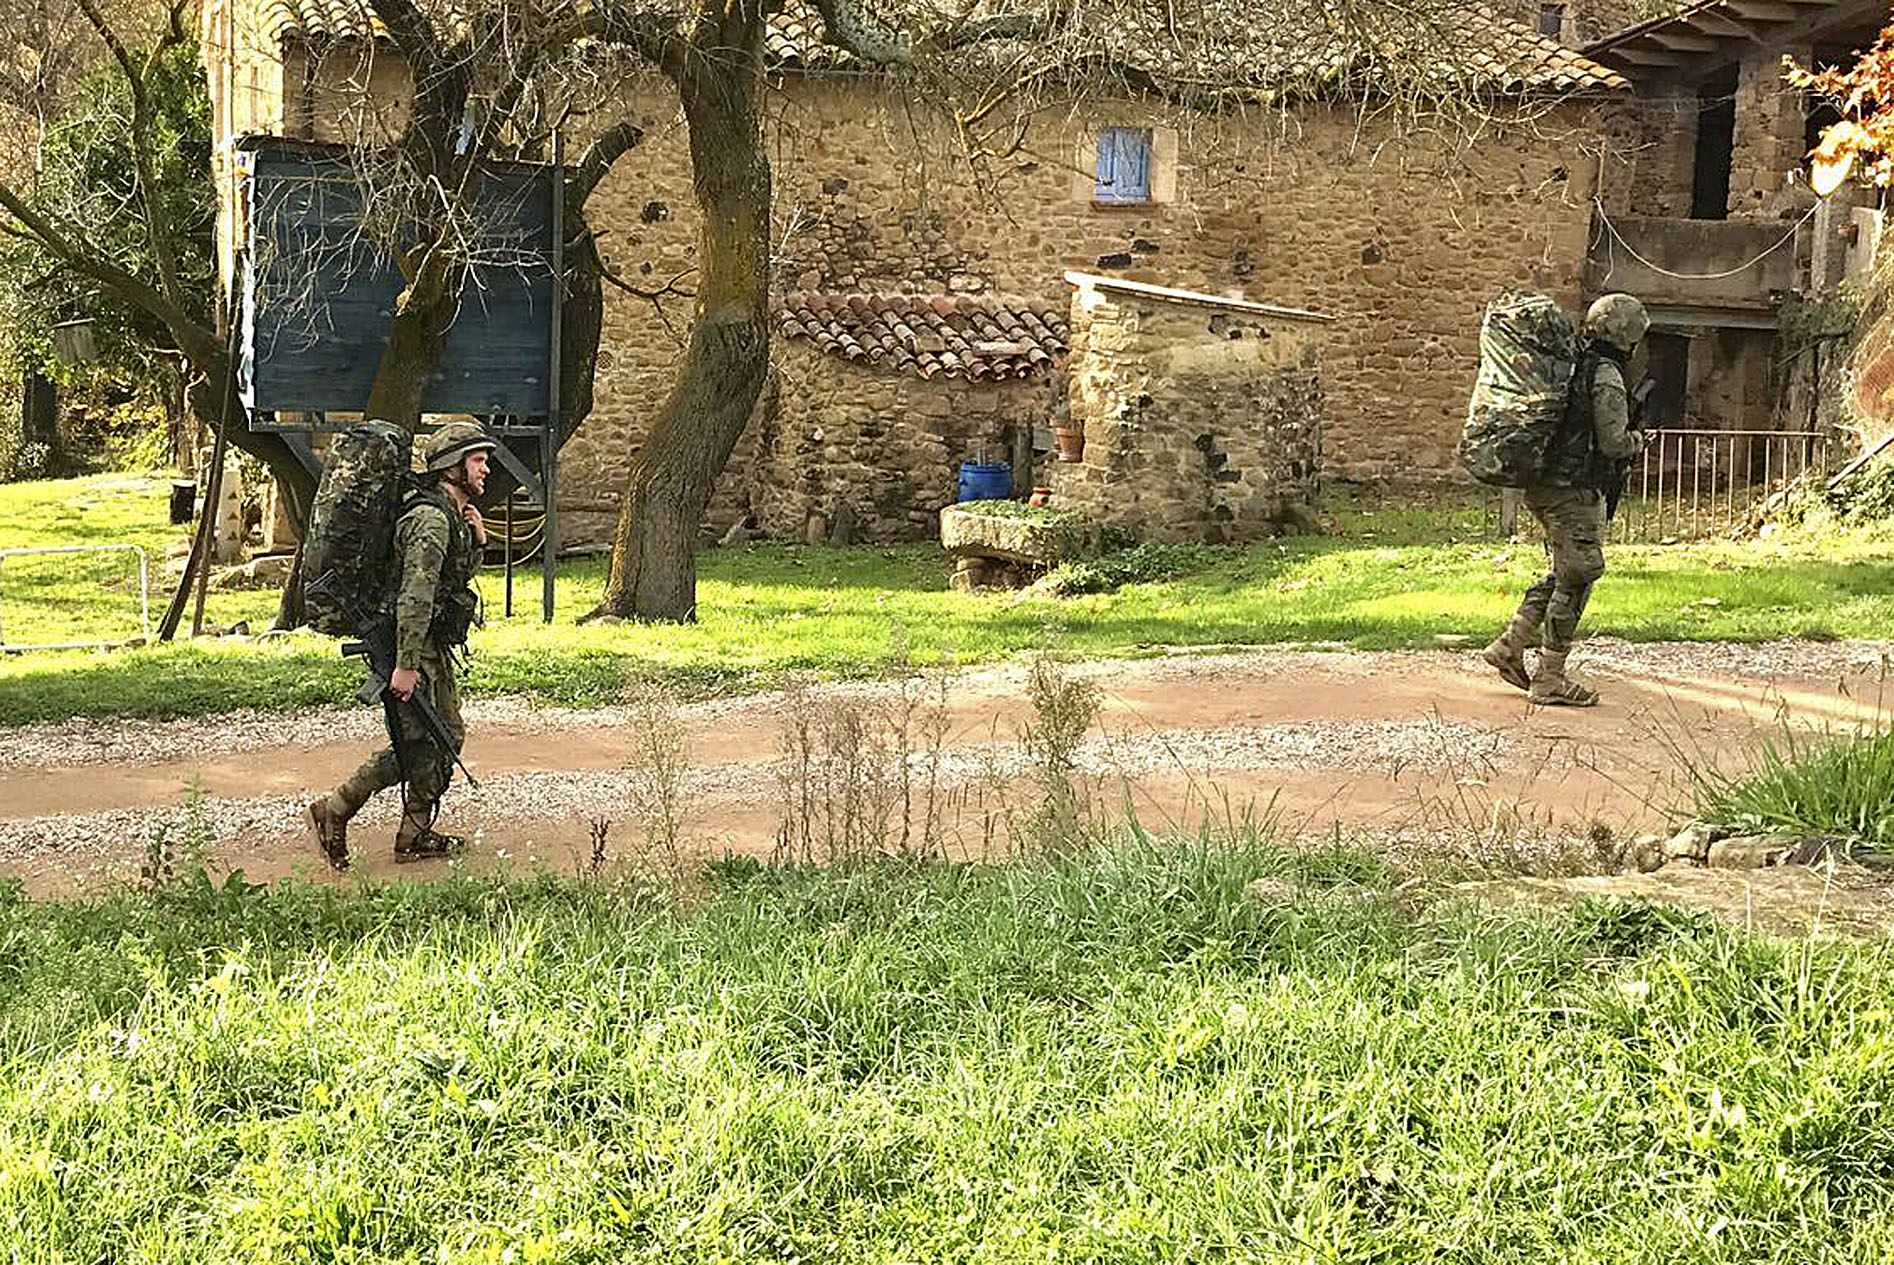 Unes maniobres militars a Canet d'Adri